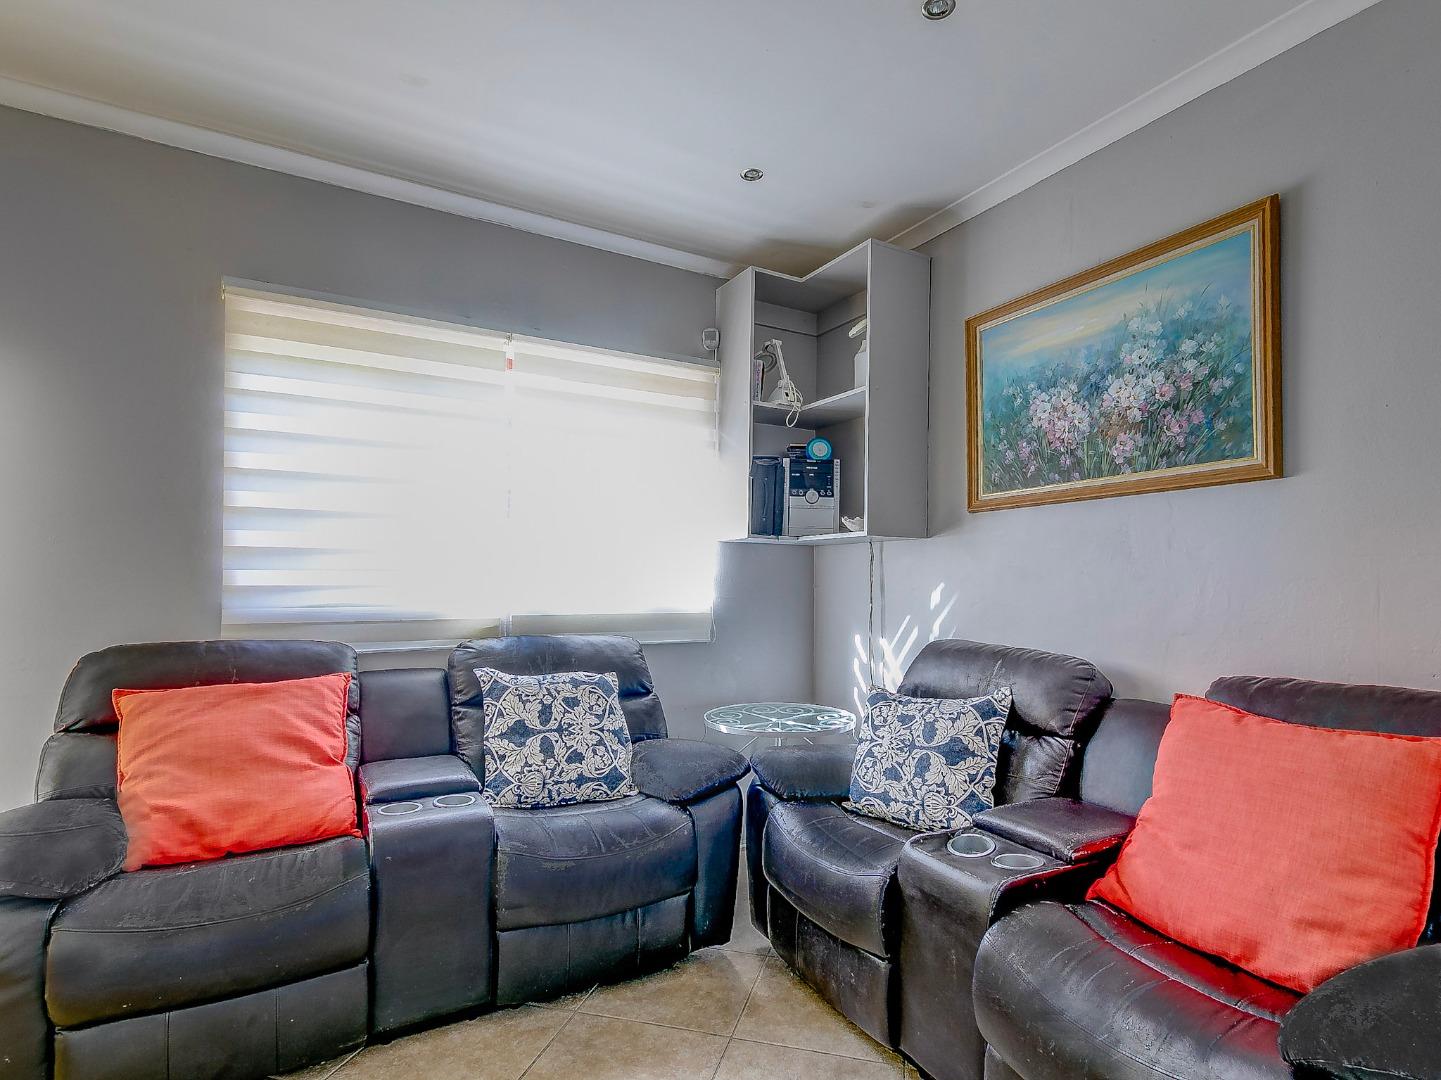 5 Bedroom House For Sale in Glencairn Heights